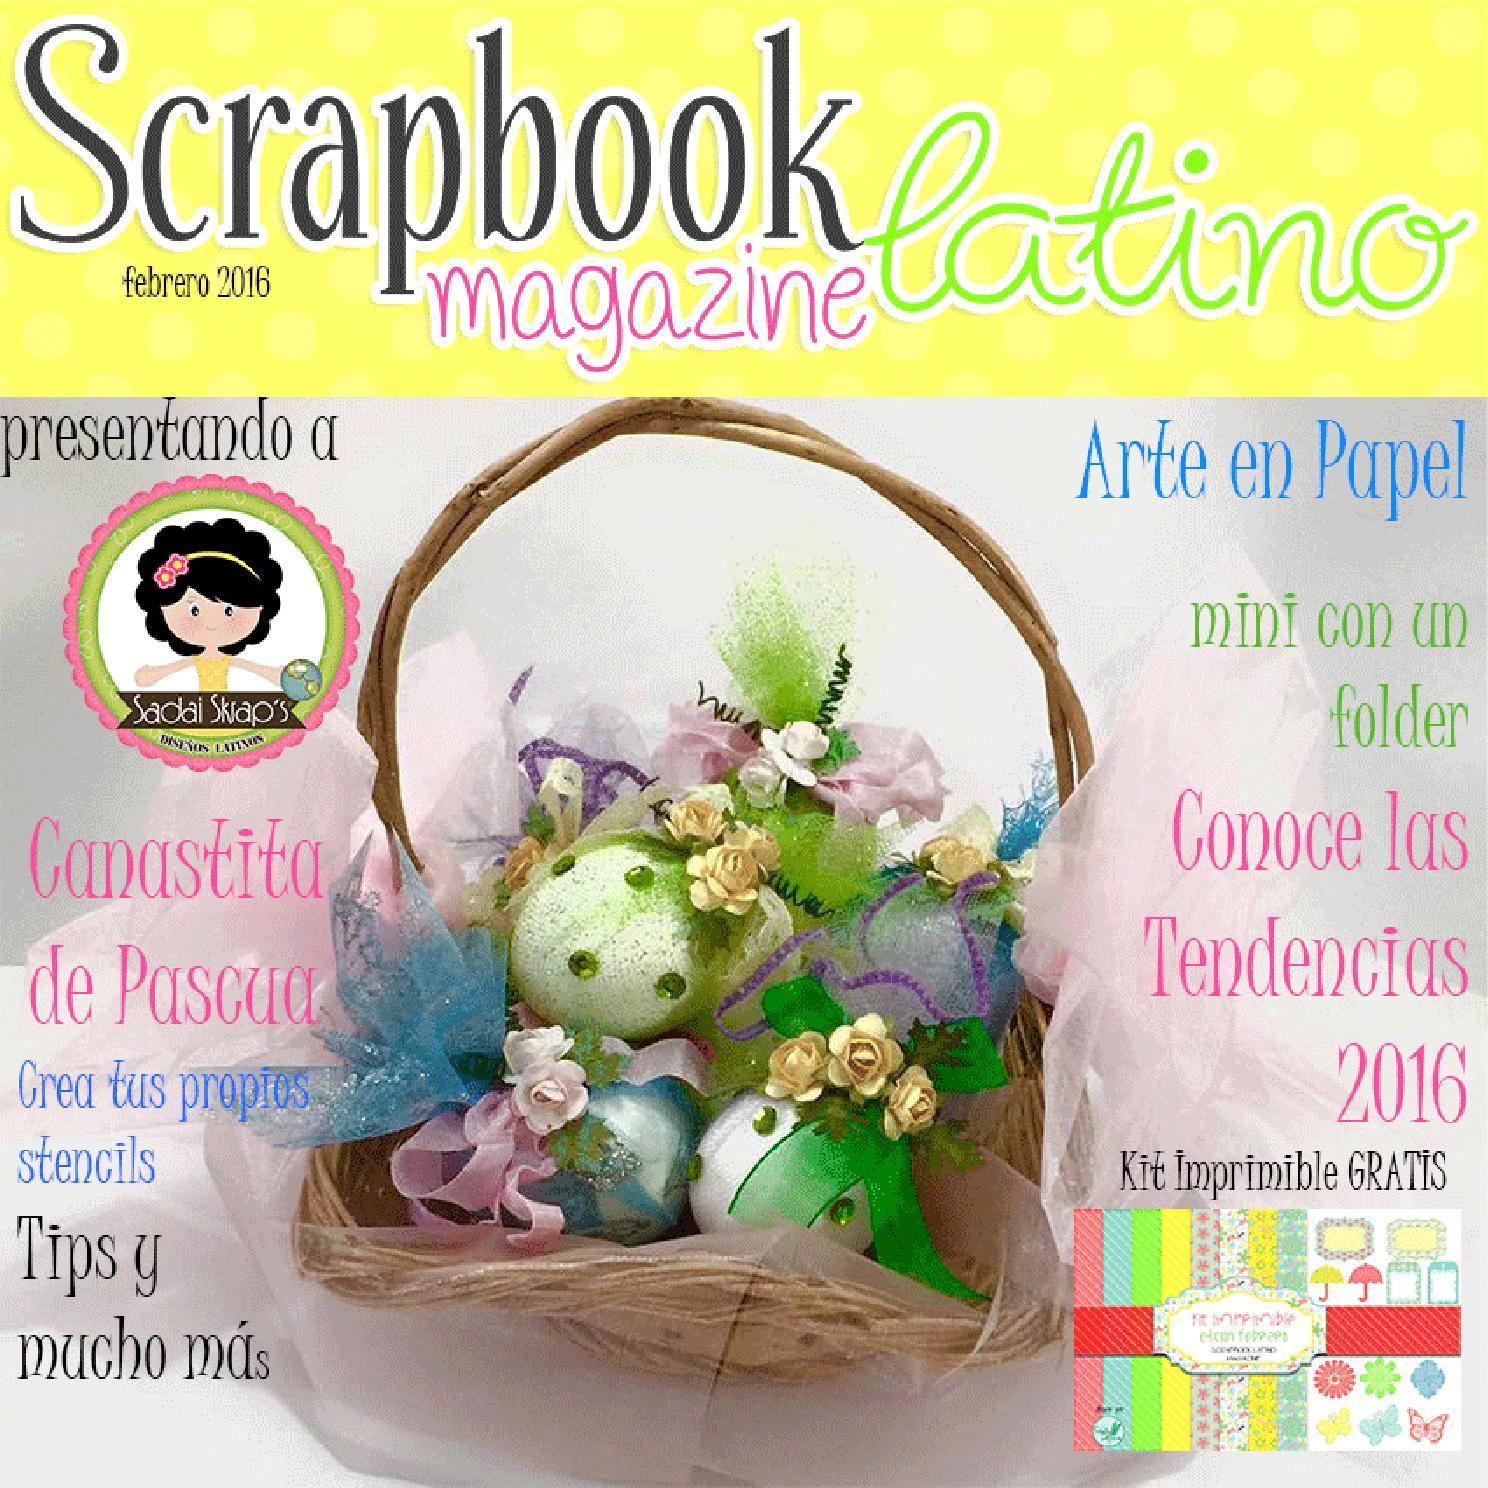 How to scrapbook magazines - Scrapbook Latino Magazine Febrero 2016